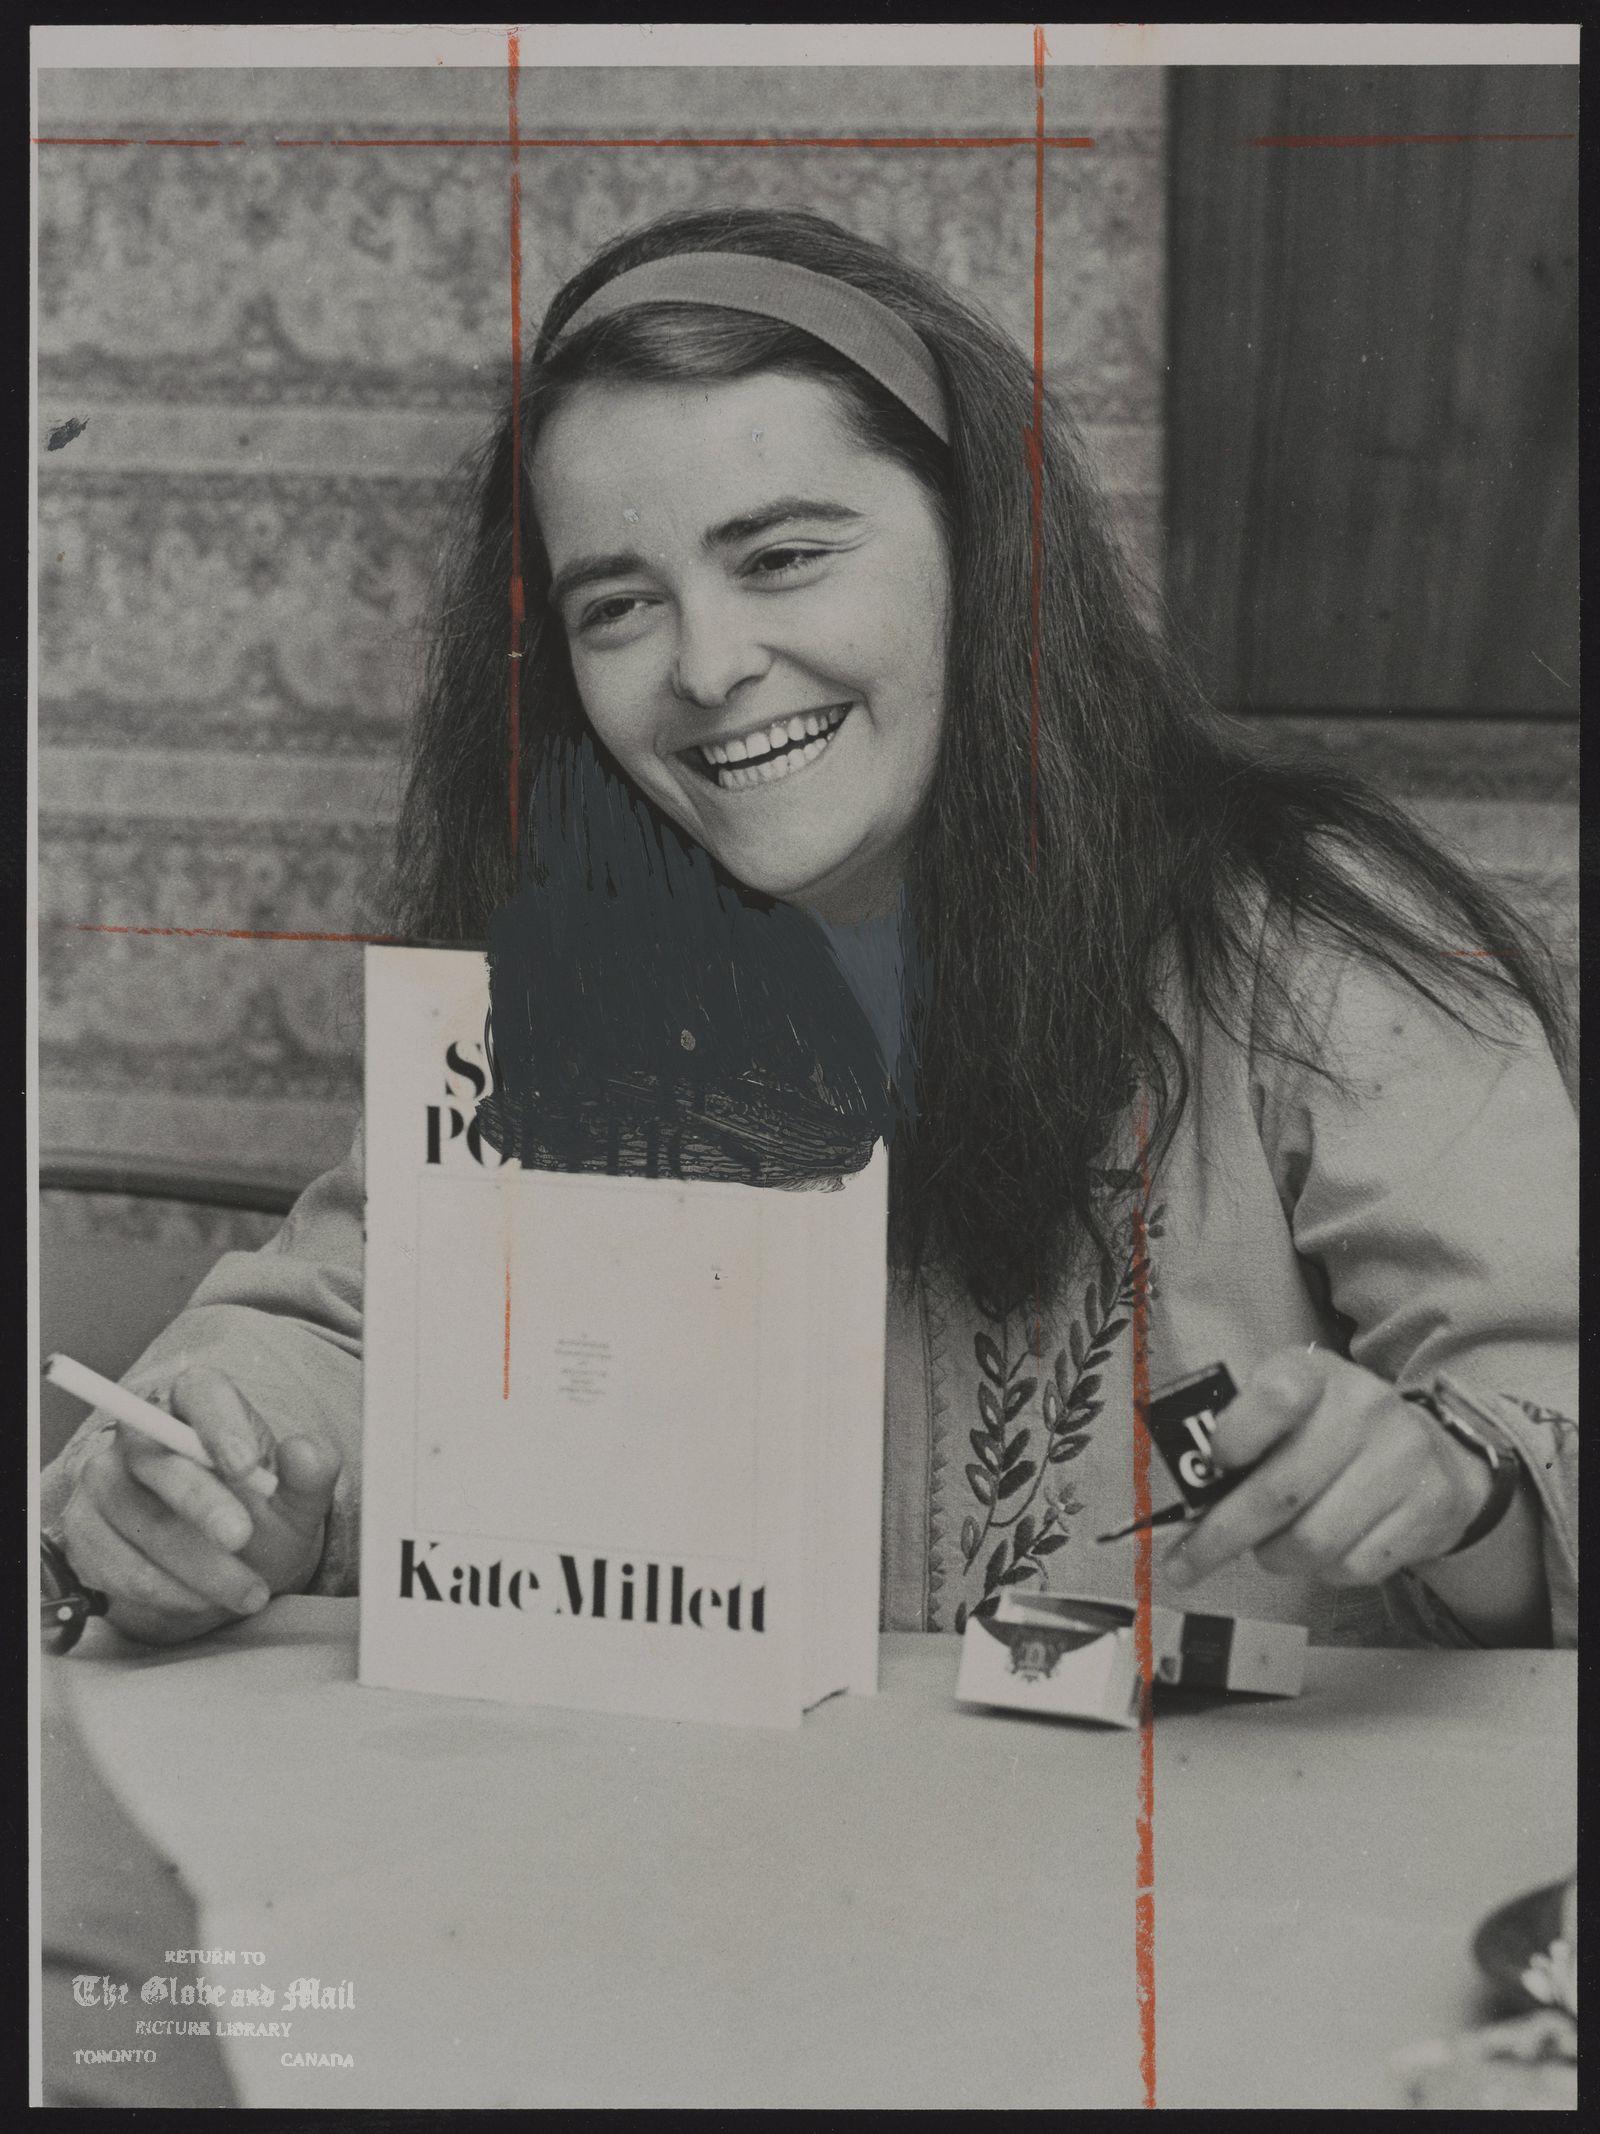 Kate MILLETT U.S.A. Author. Women's Liberation.